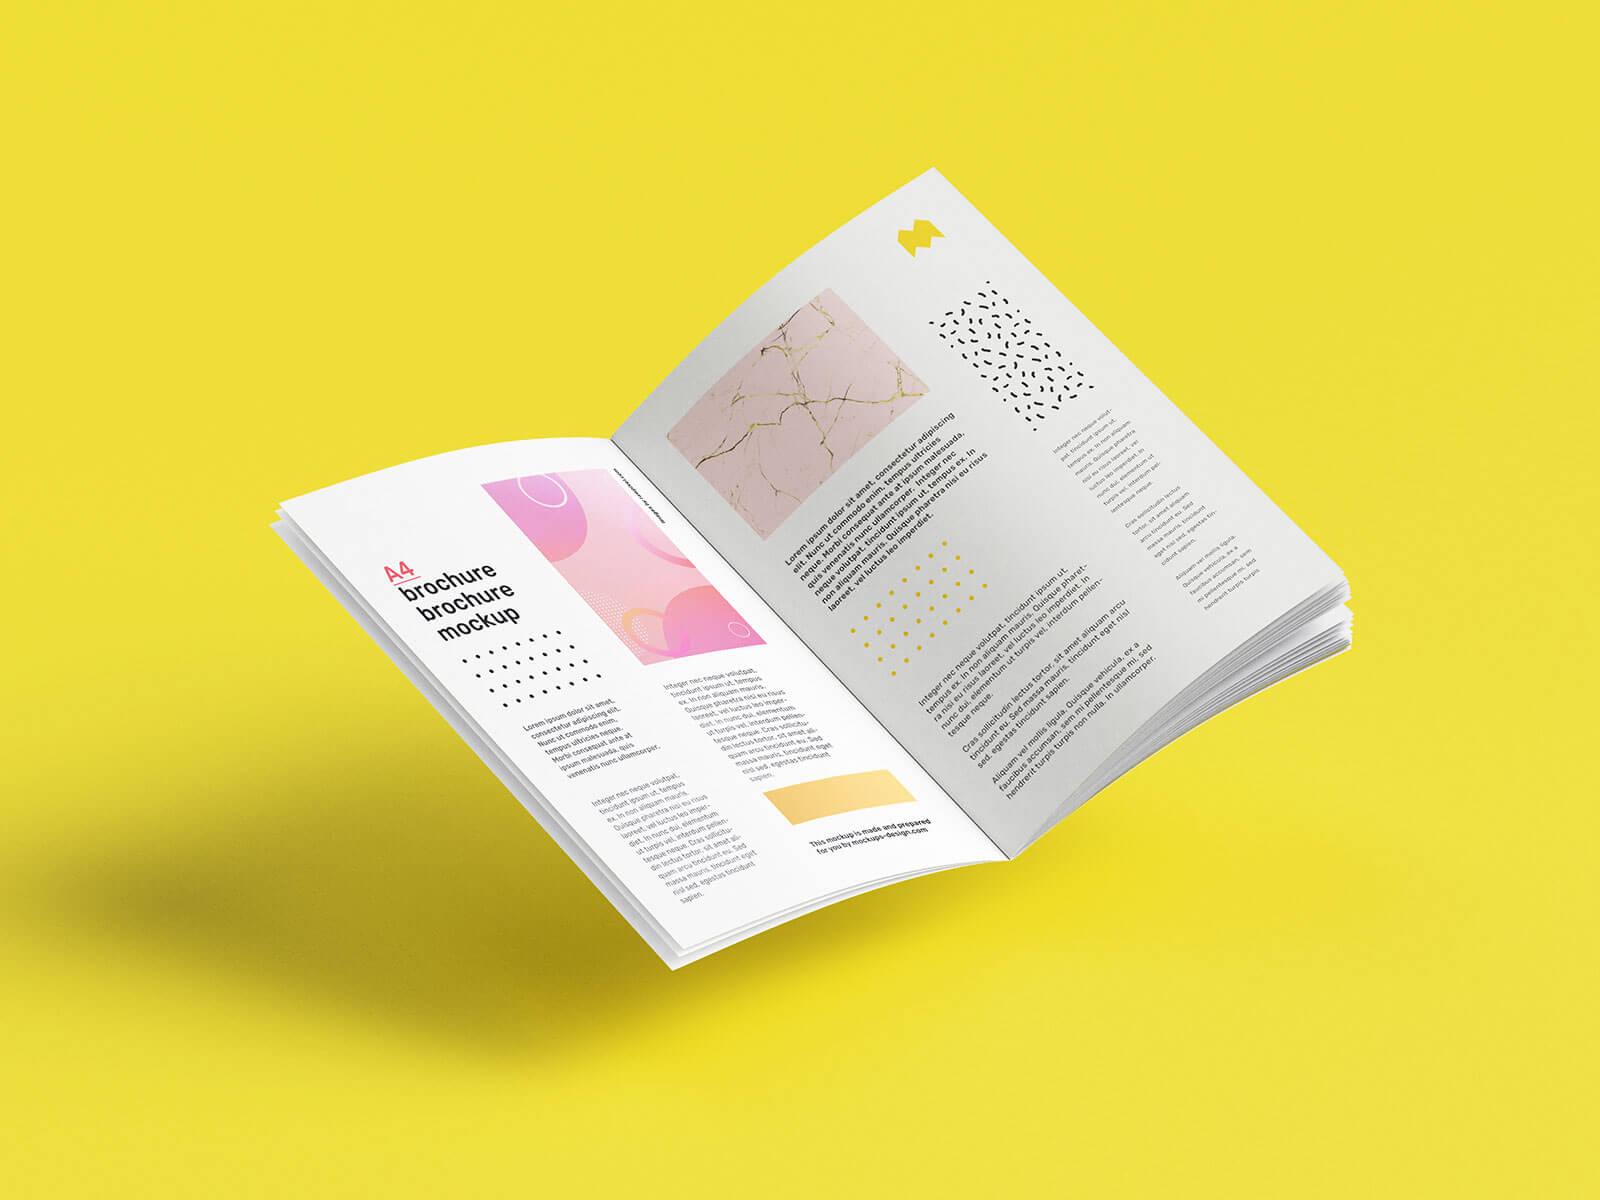 Free A4 Multipage Book Brochure Mockup PSD Set